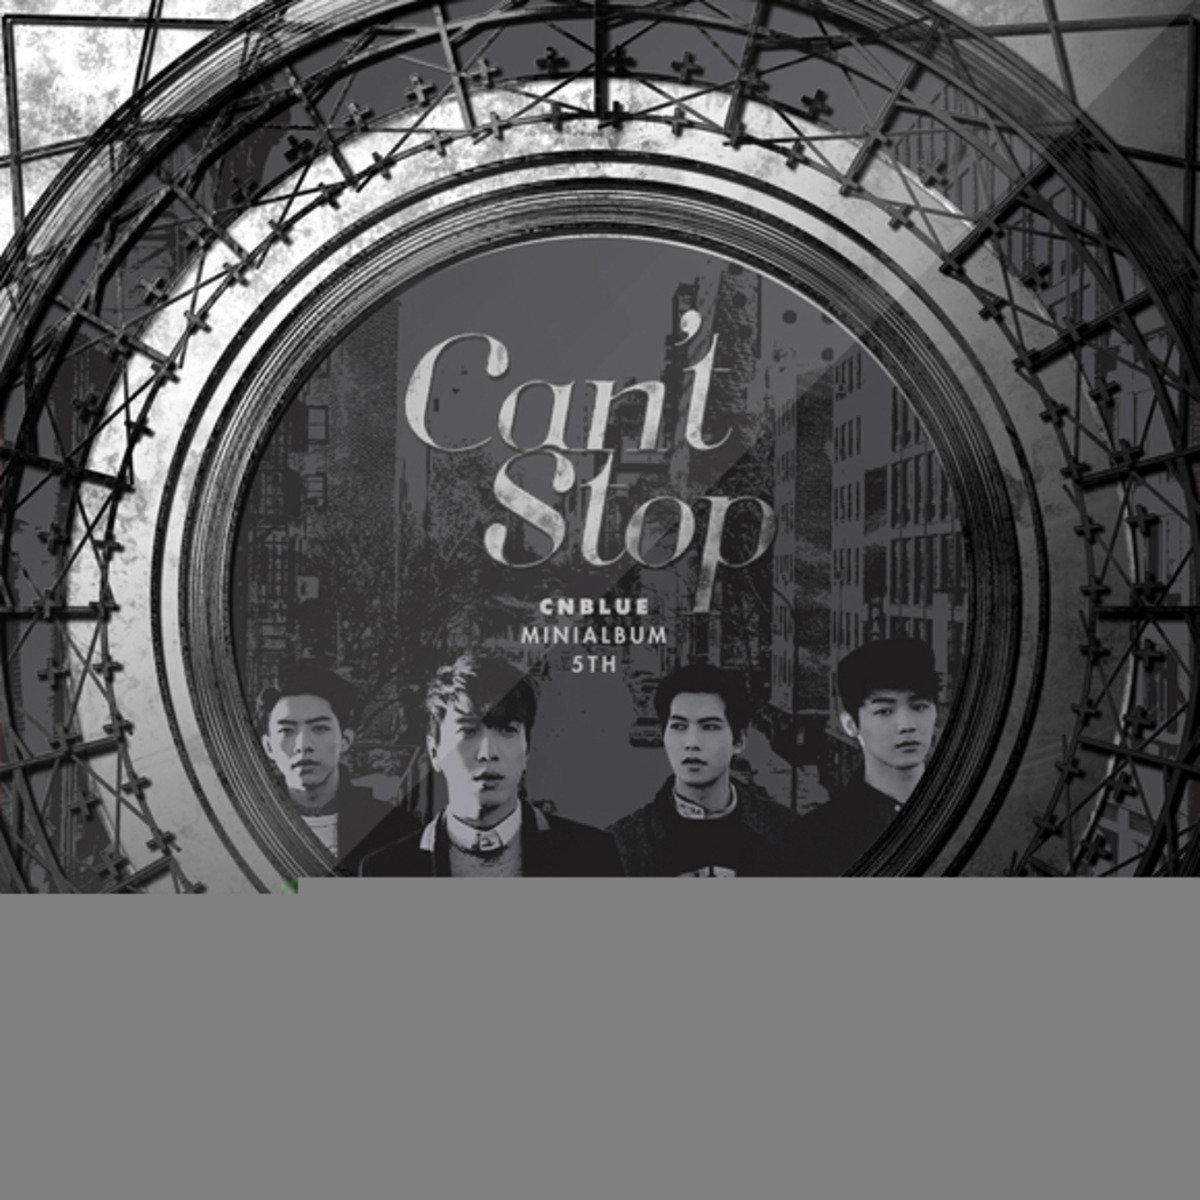 CNBLUE - Mini Album Vol. 5 [Can't Stop Ⅱ] (+ Member Random Standing Paper 1p) _48552